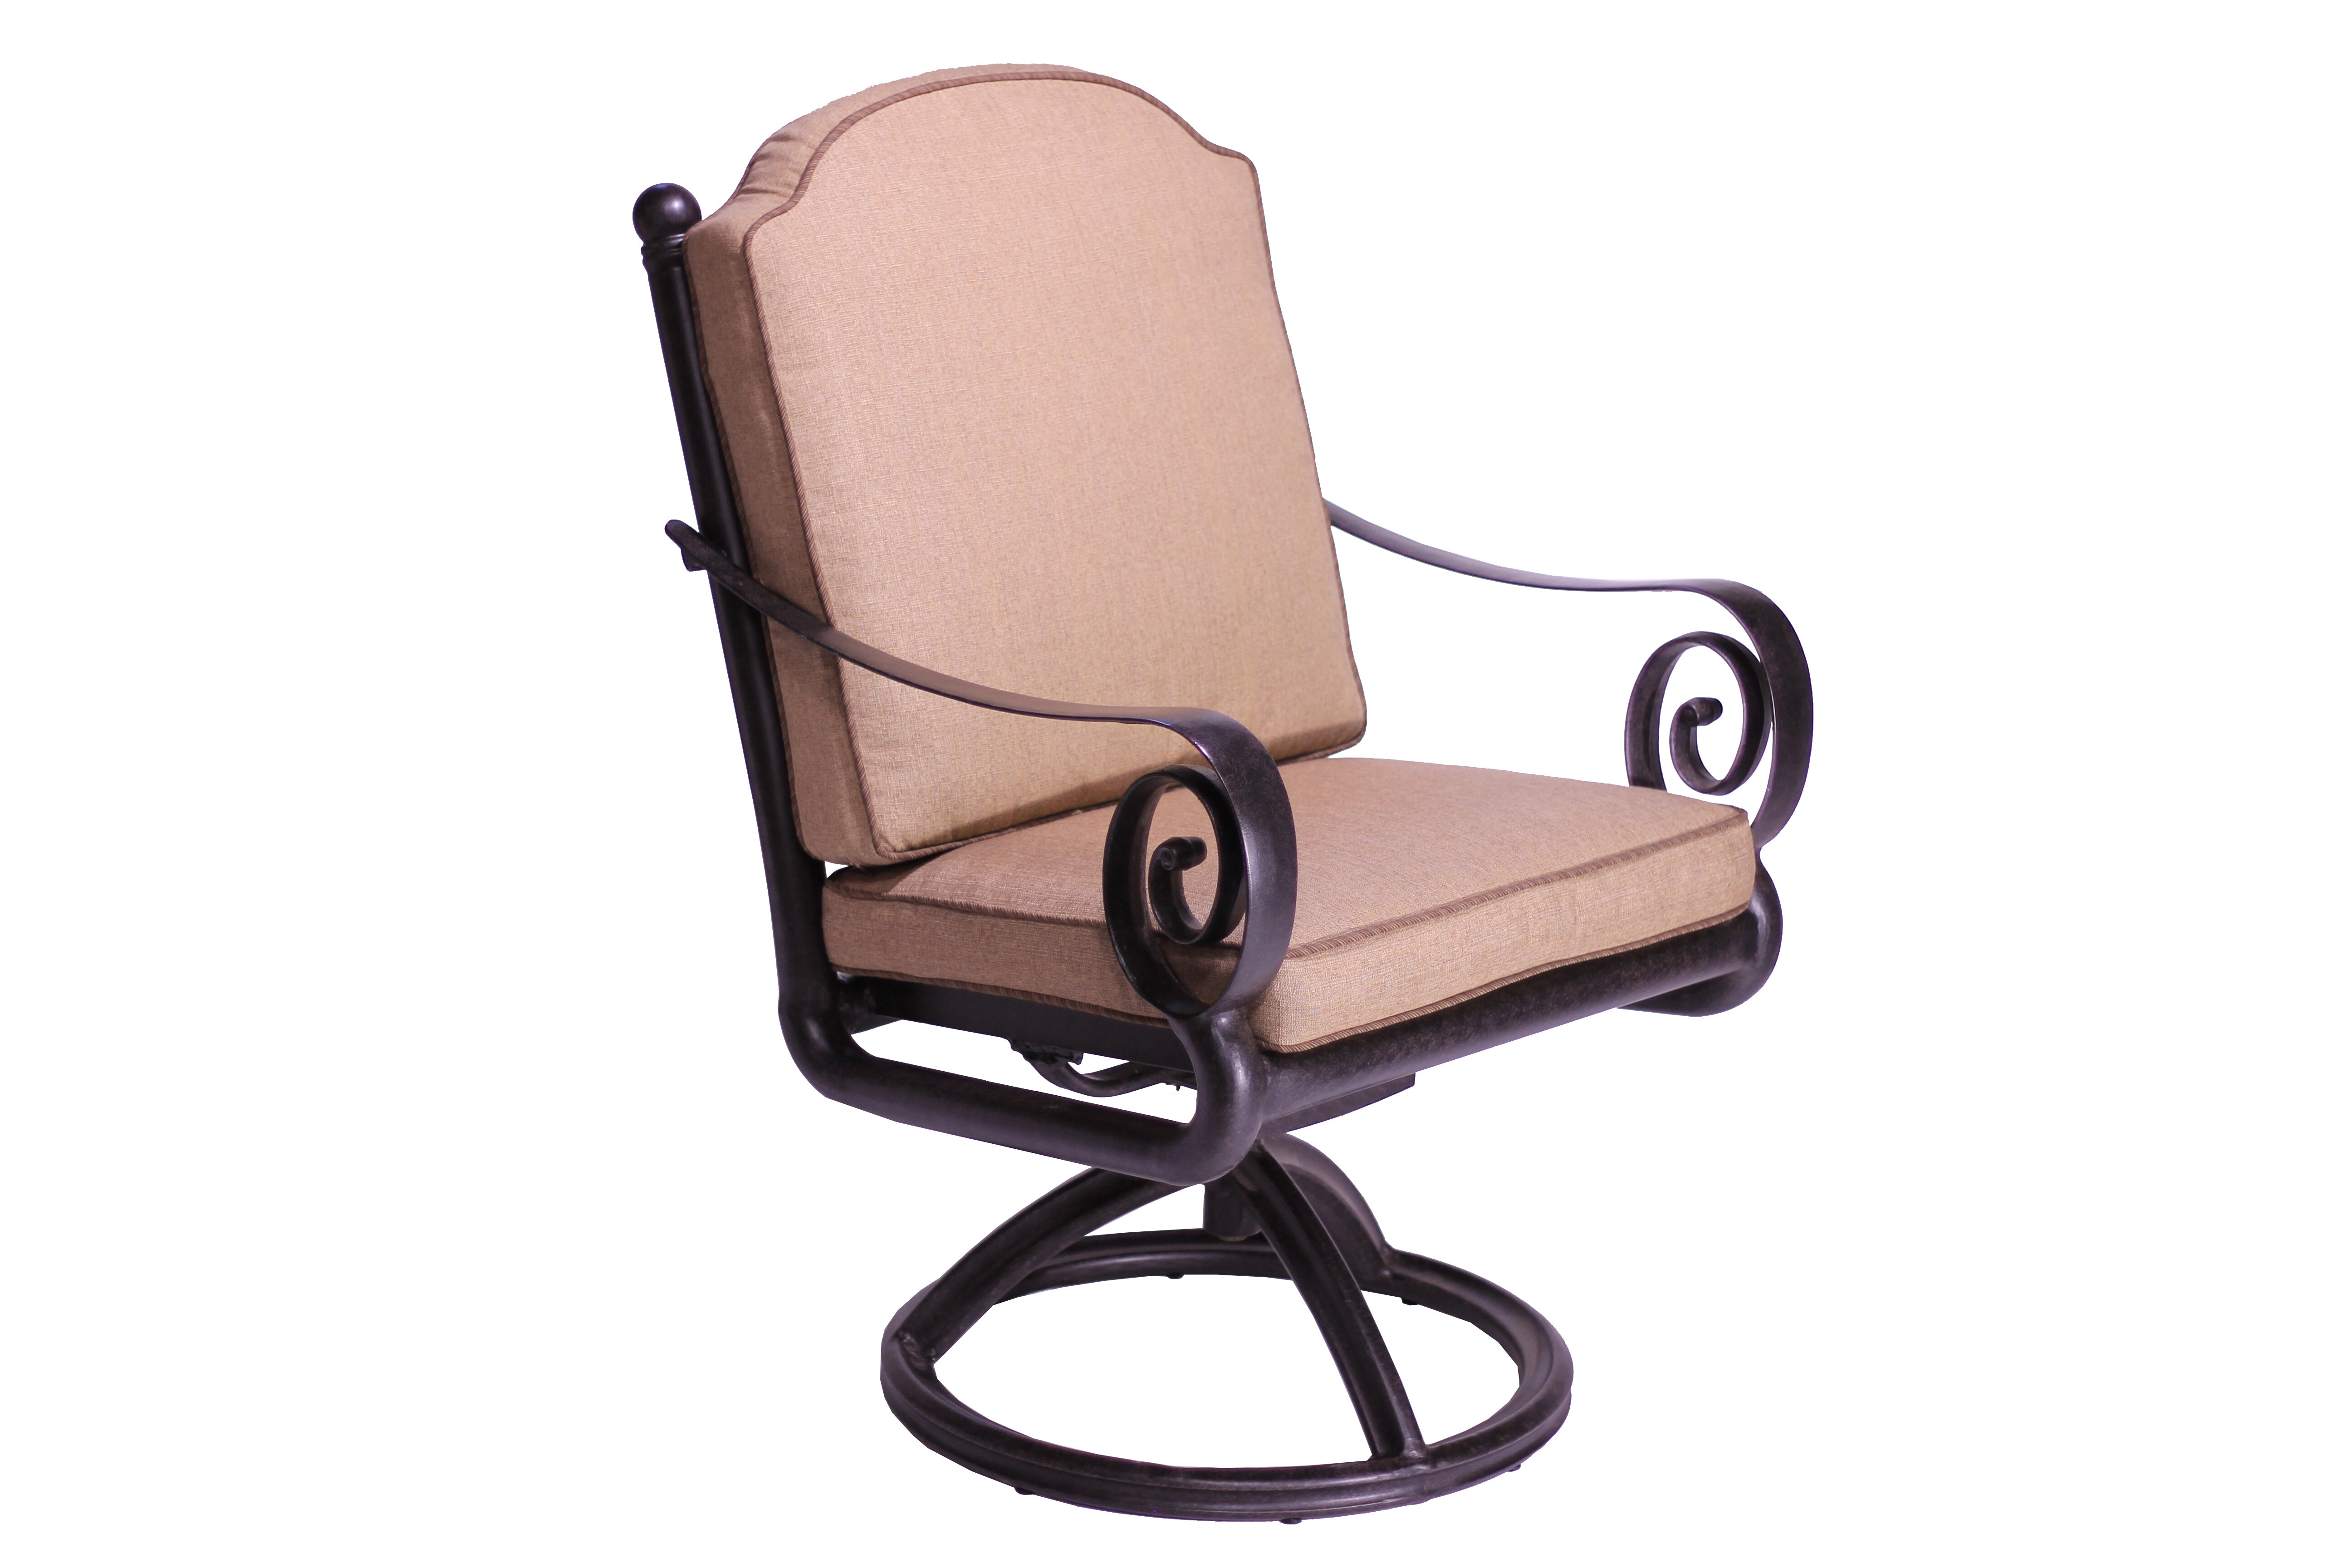 Sensational Westhampton Swivel Patio Dining Chair With Cushion Beatyapartments Chair Design Images Beatyapartmentscom